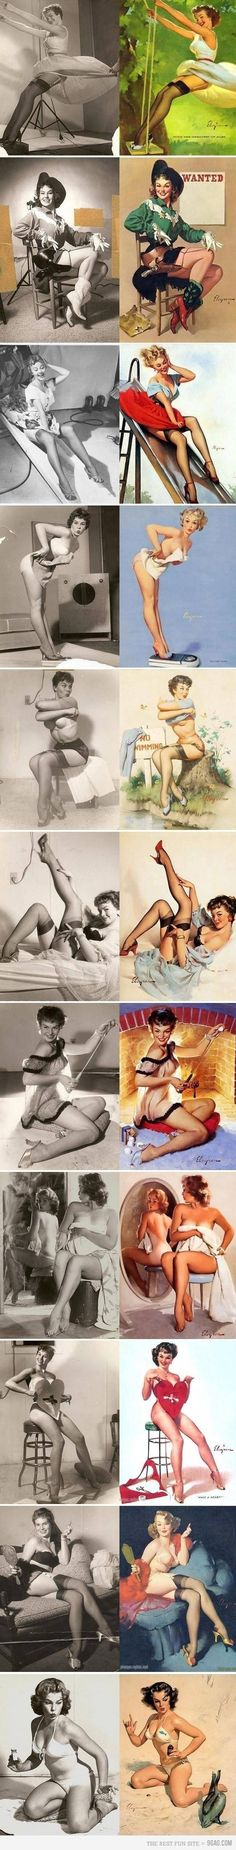 Vintage Retro Sexy Women Images